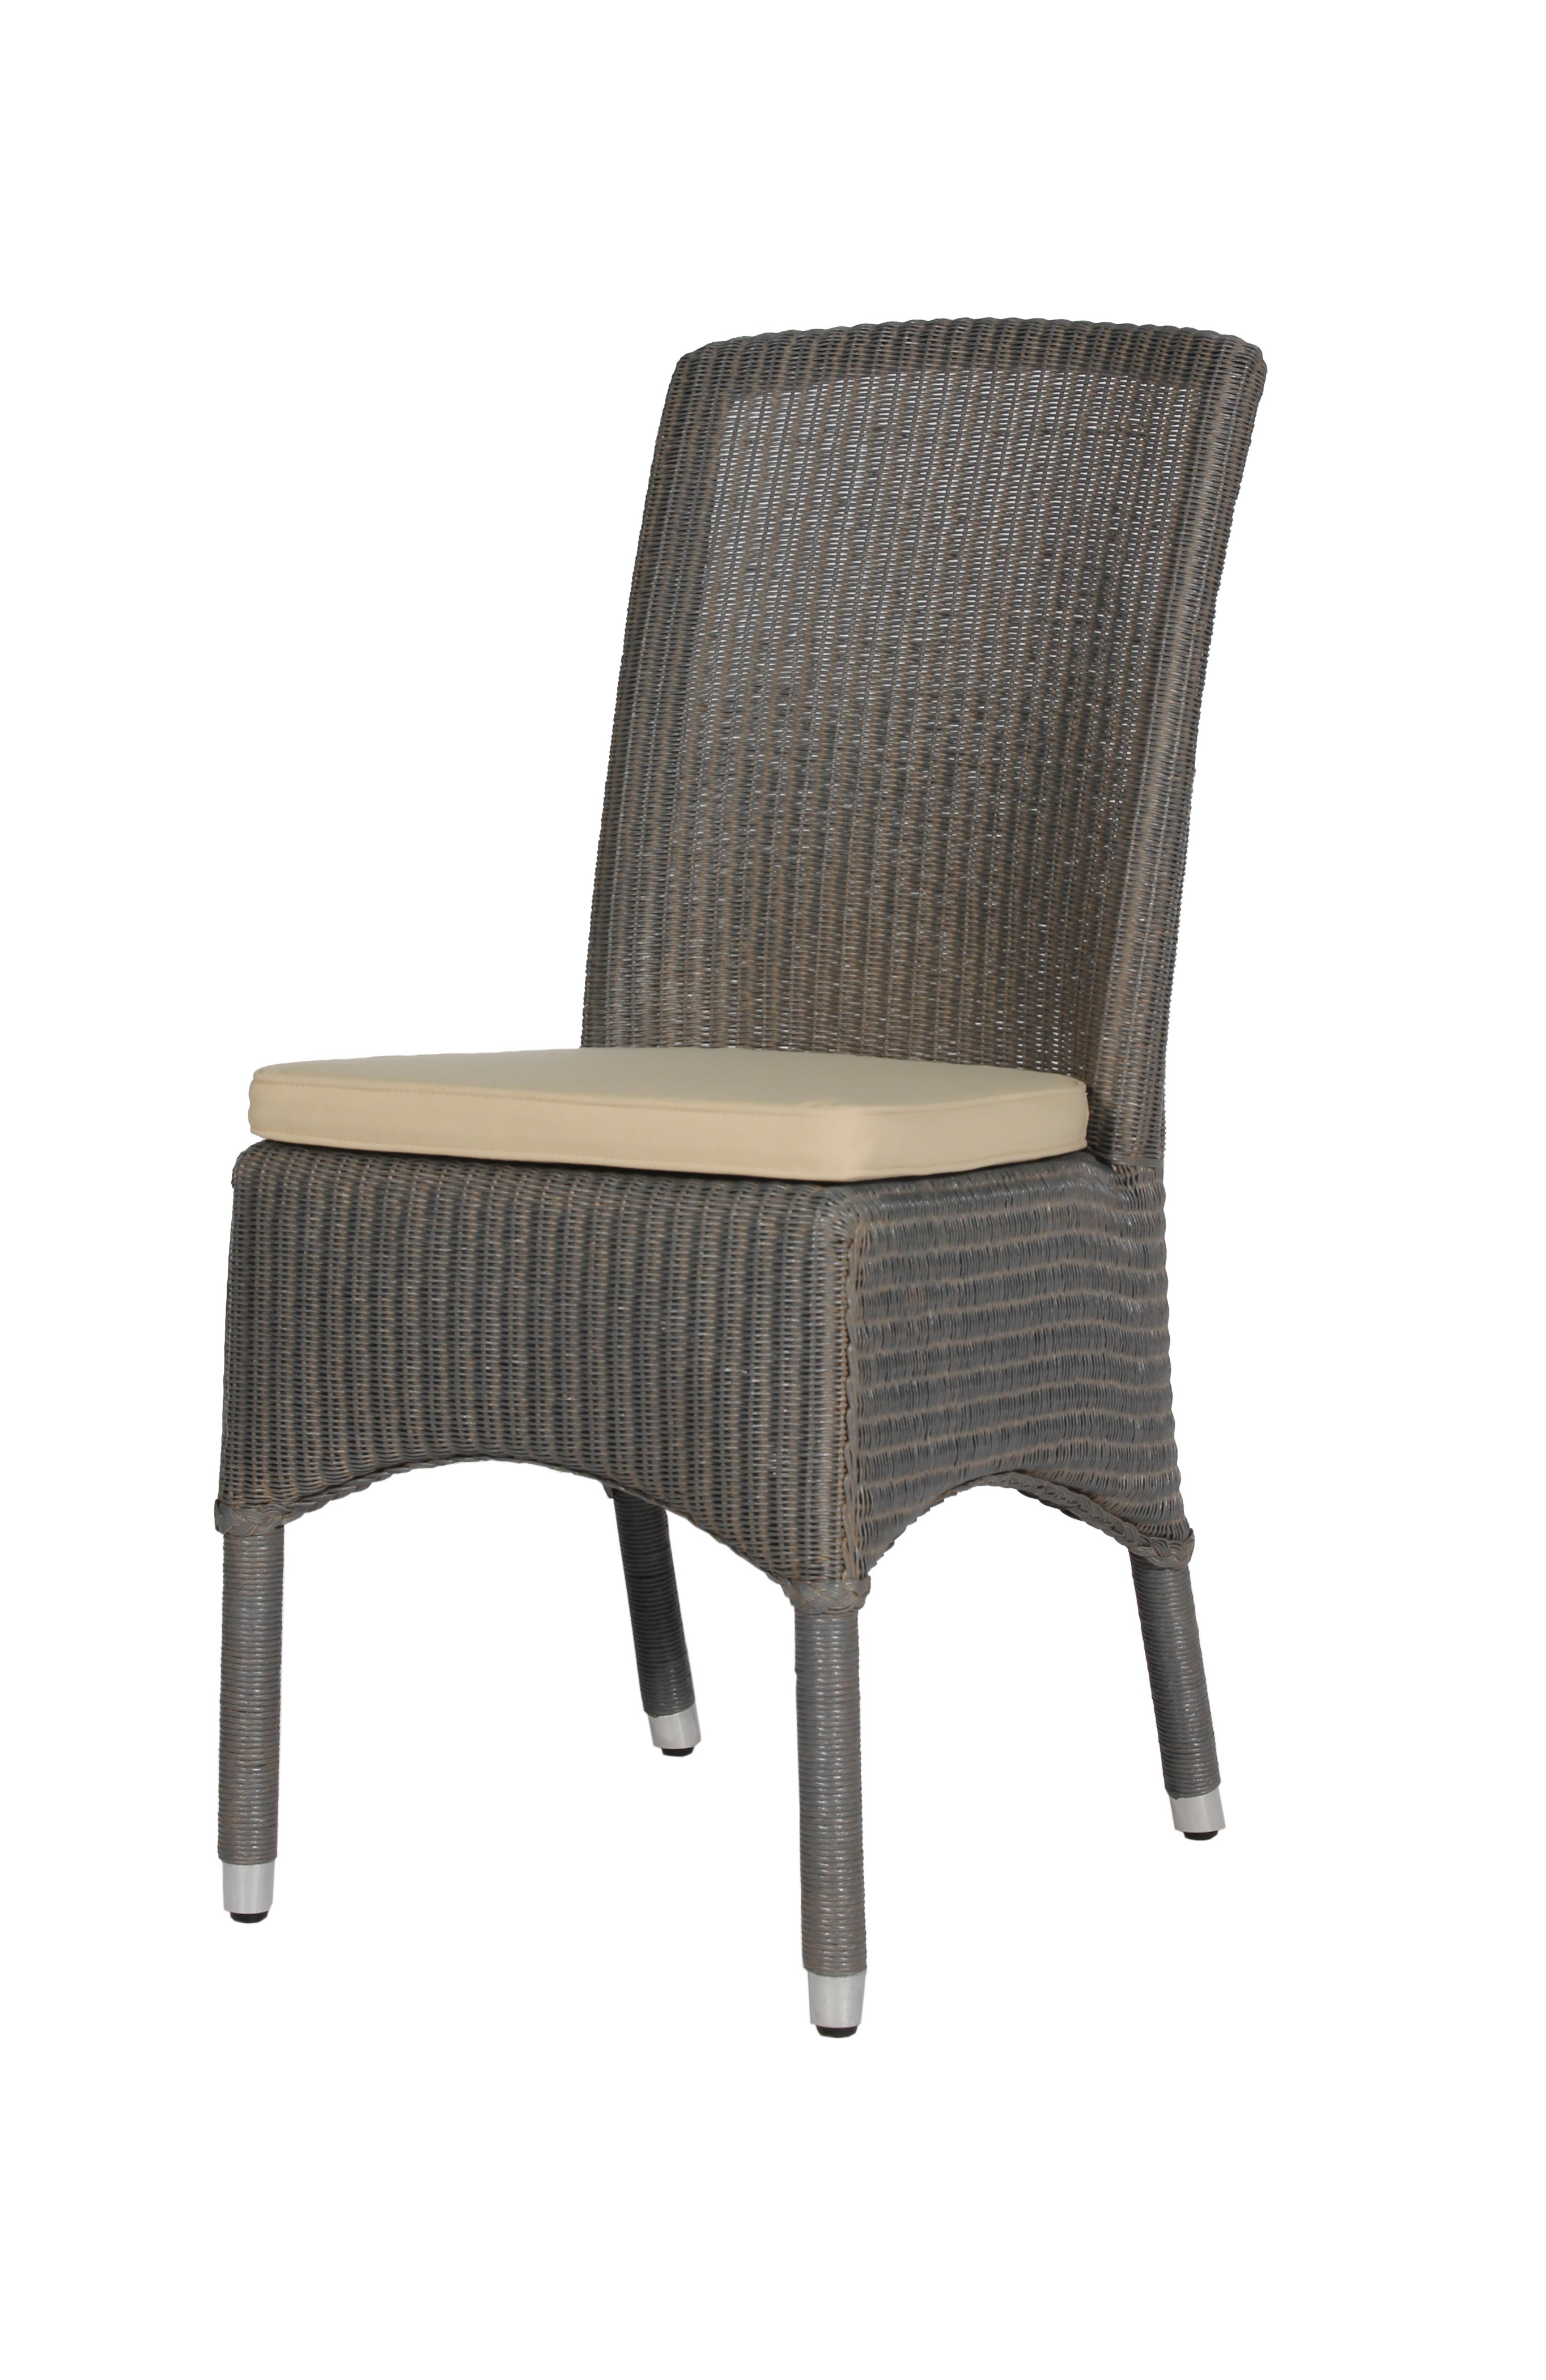 chaise sophia de vincent sheppard nordic grey. Black Bedroom Furniture Sets. Home Design Ideas